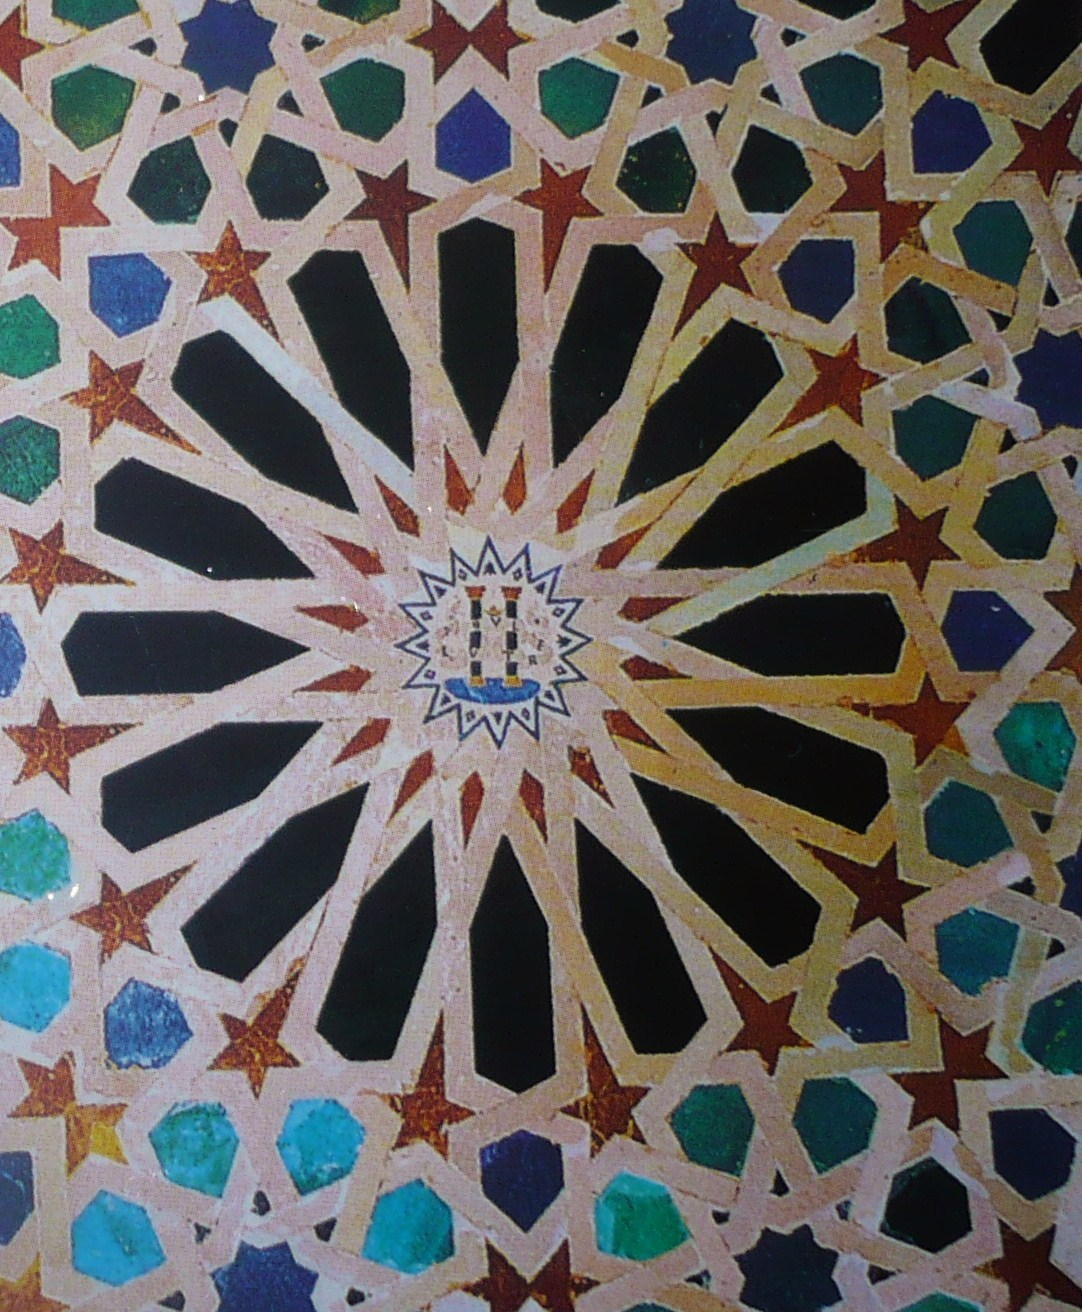 ceramique-andalouse-008.JPG